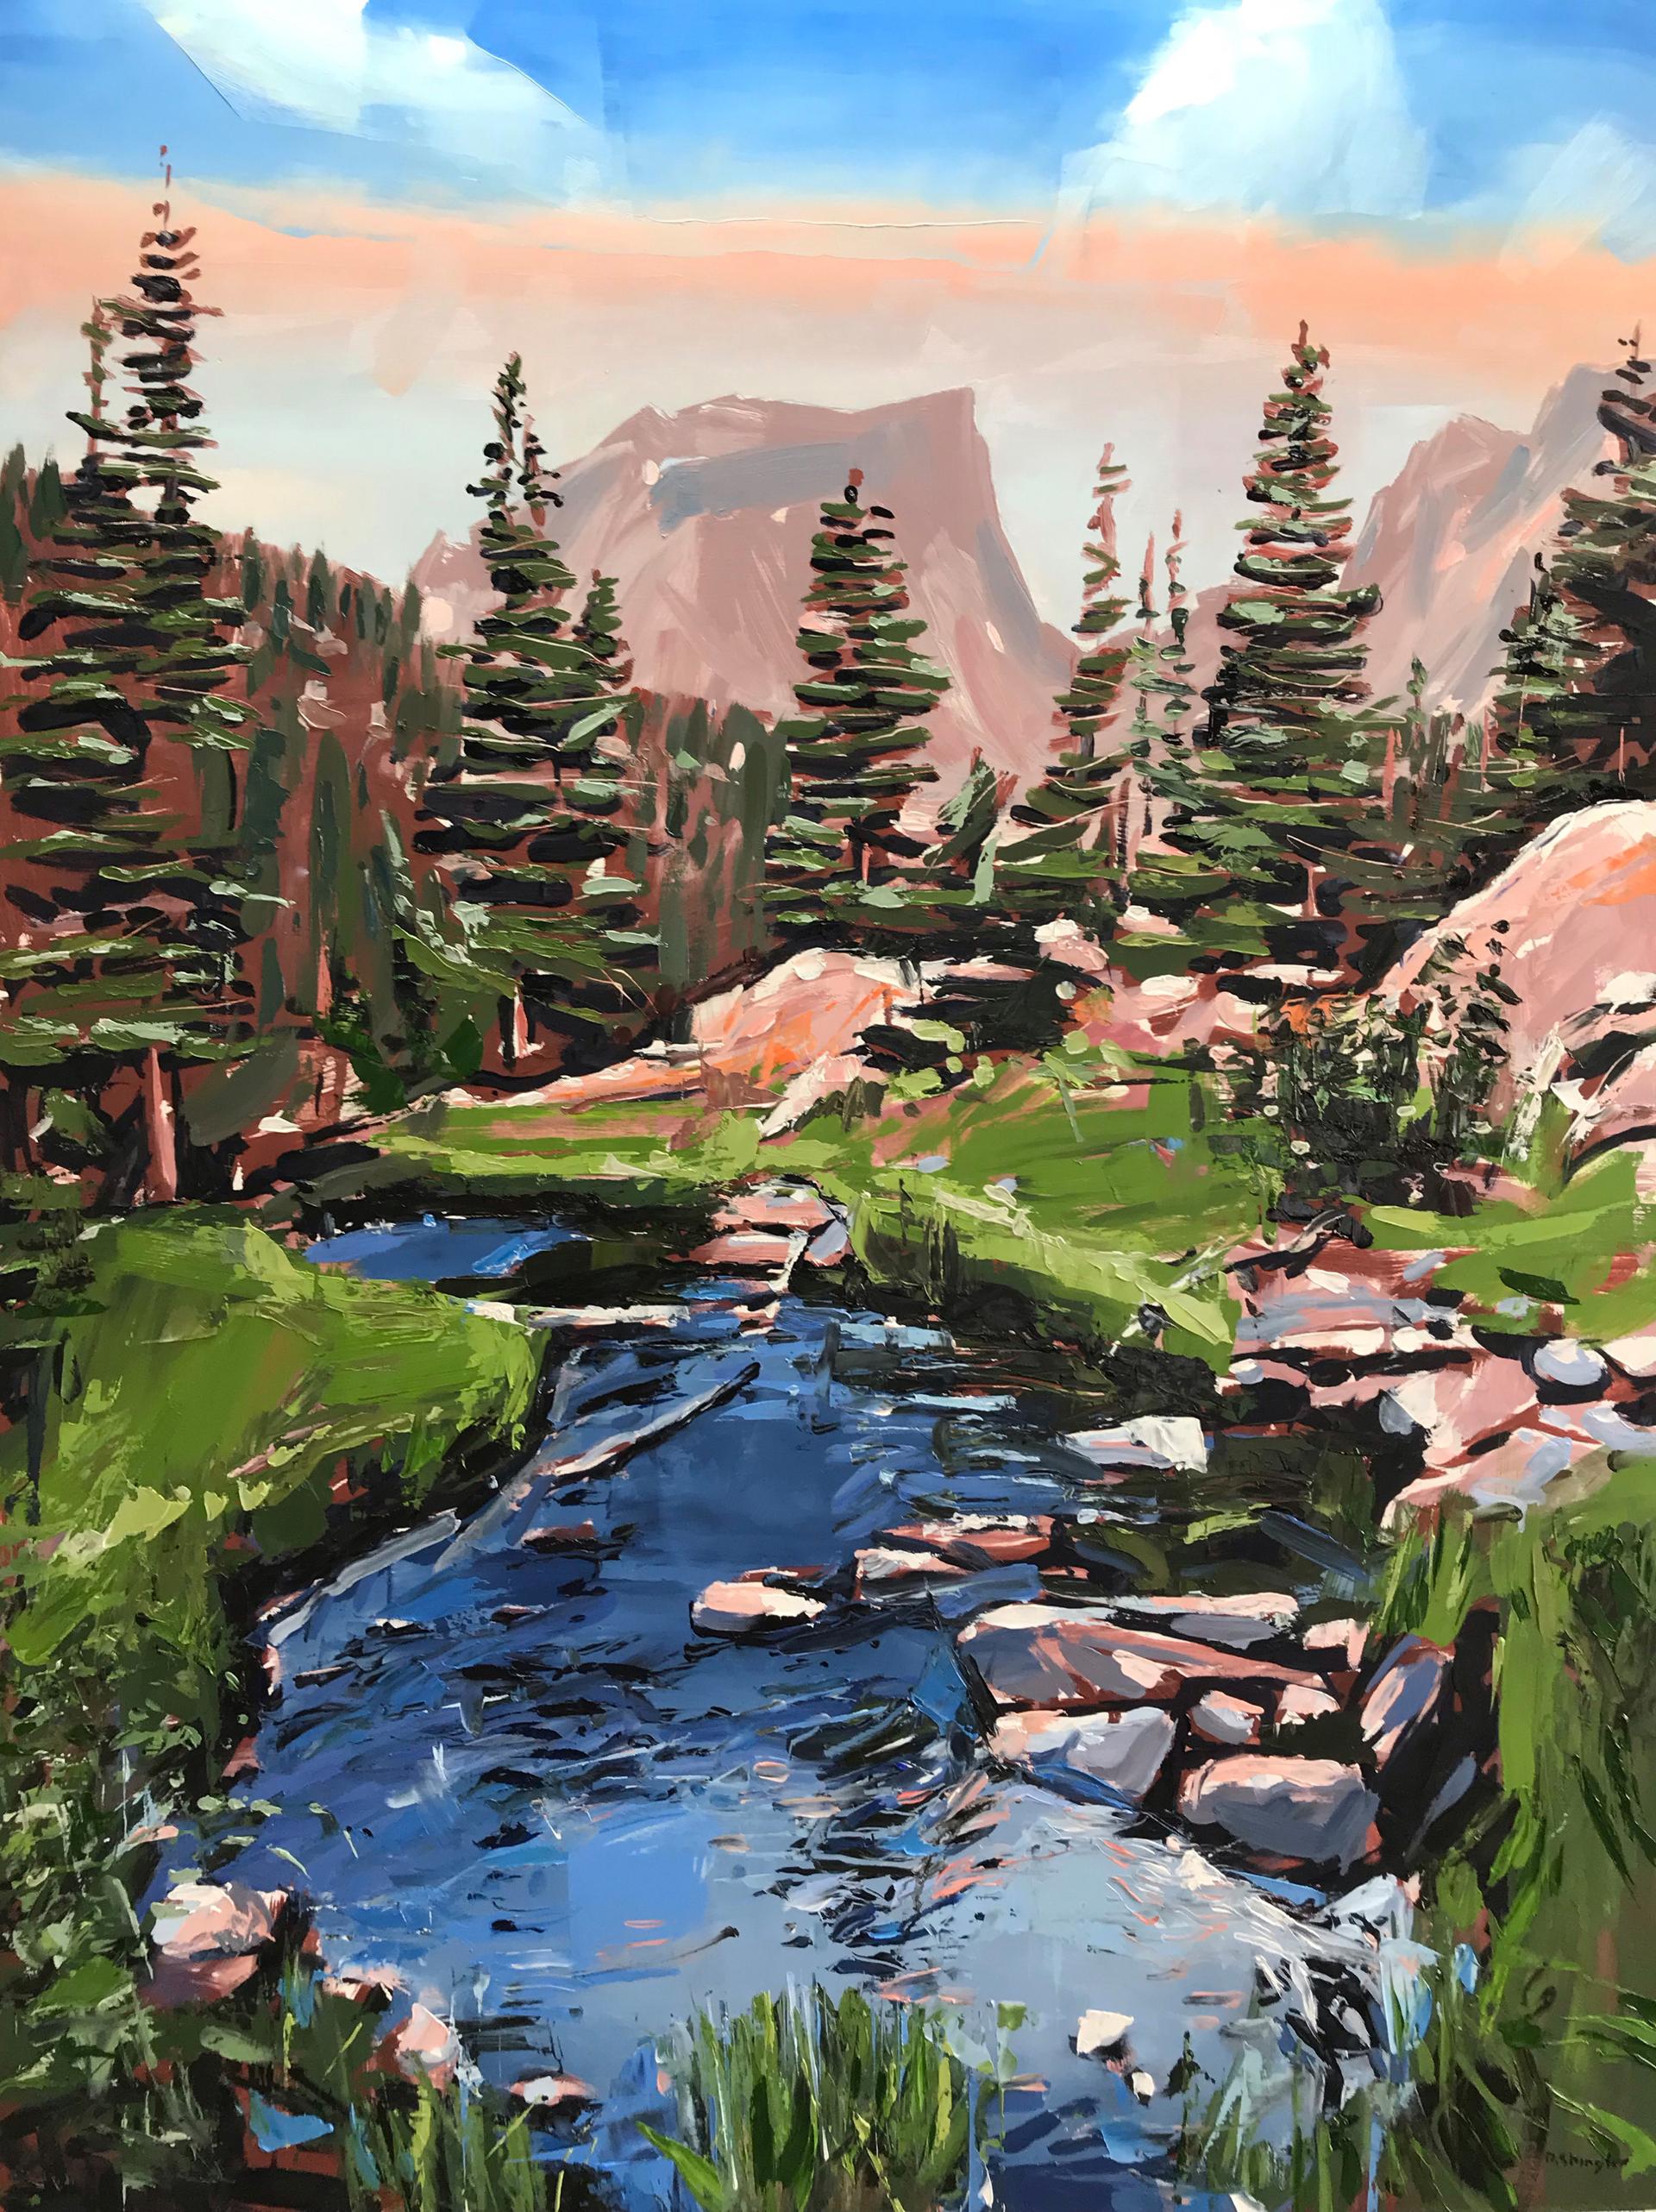 Dream Lake, RMNP, CO by David Shingler